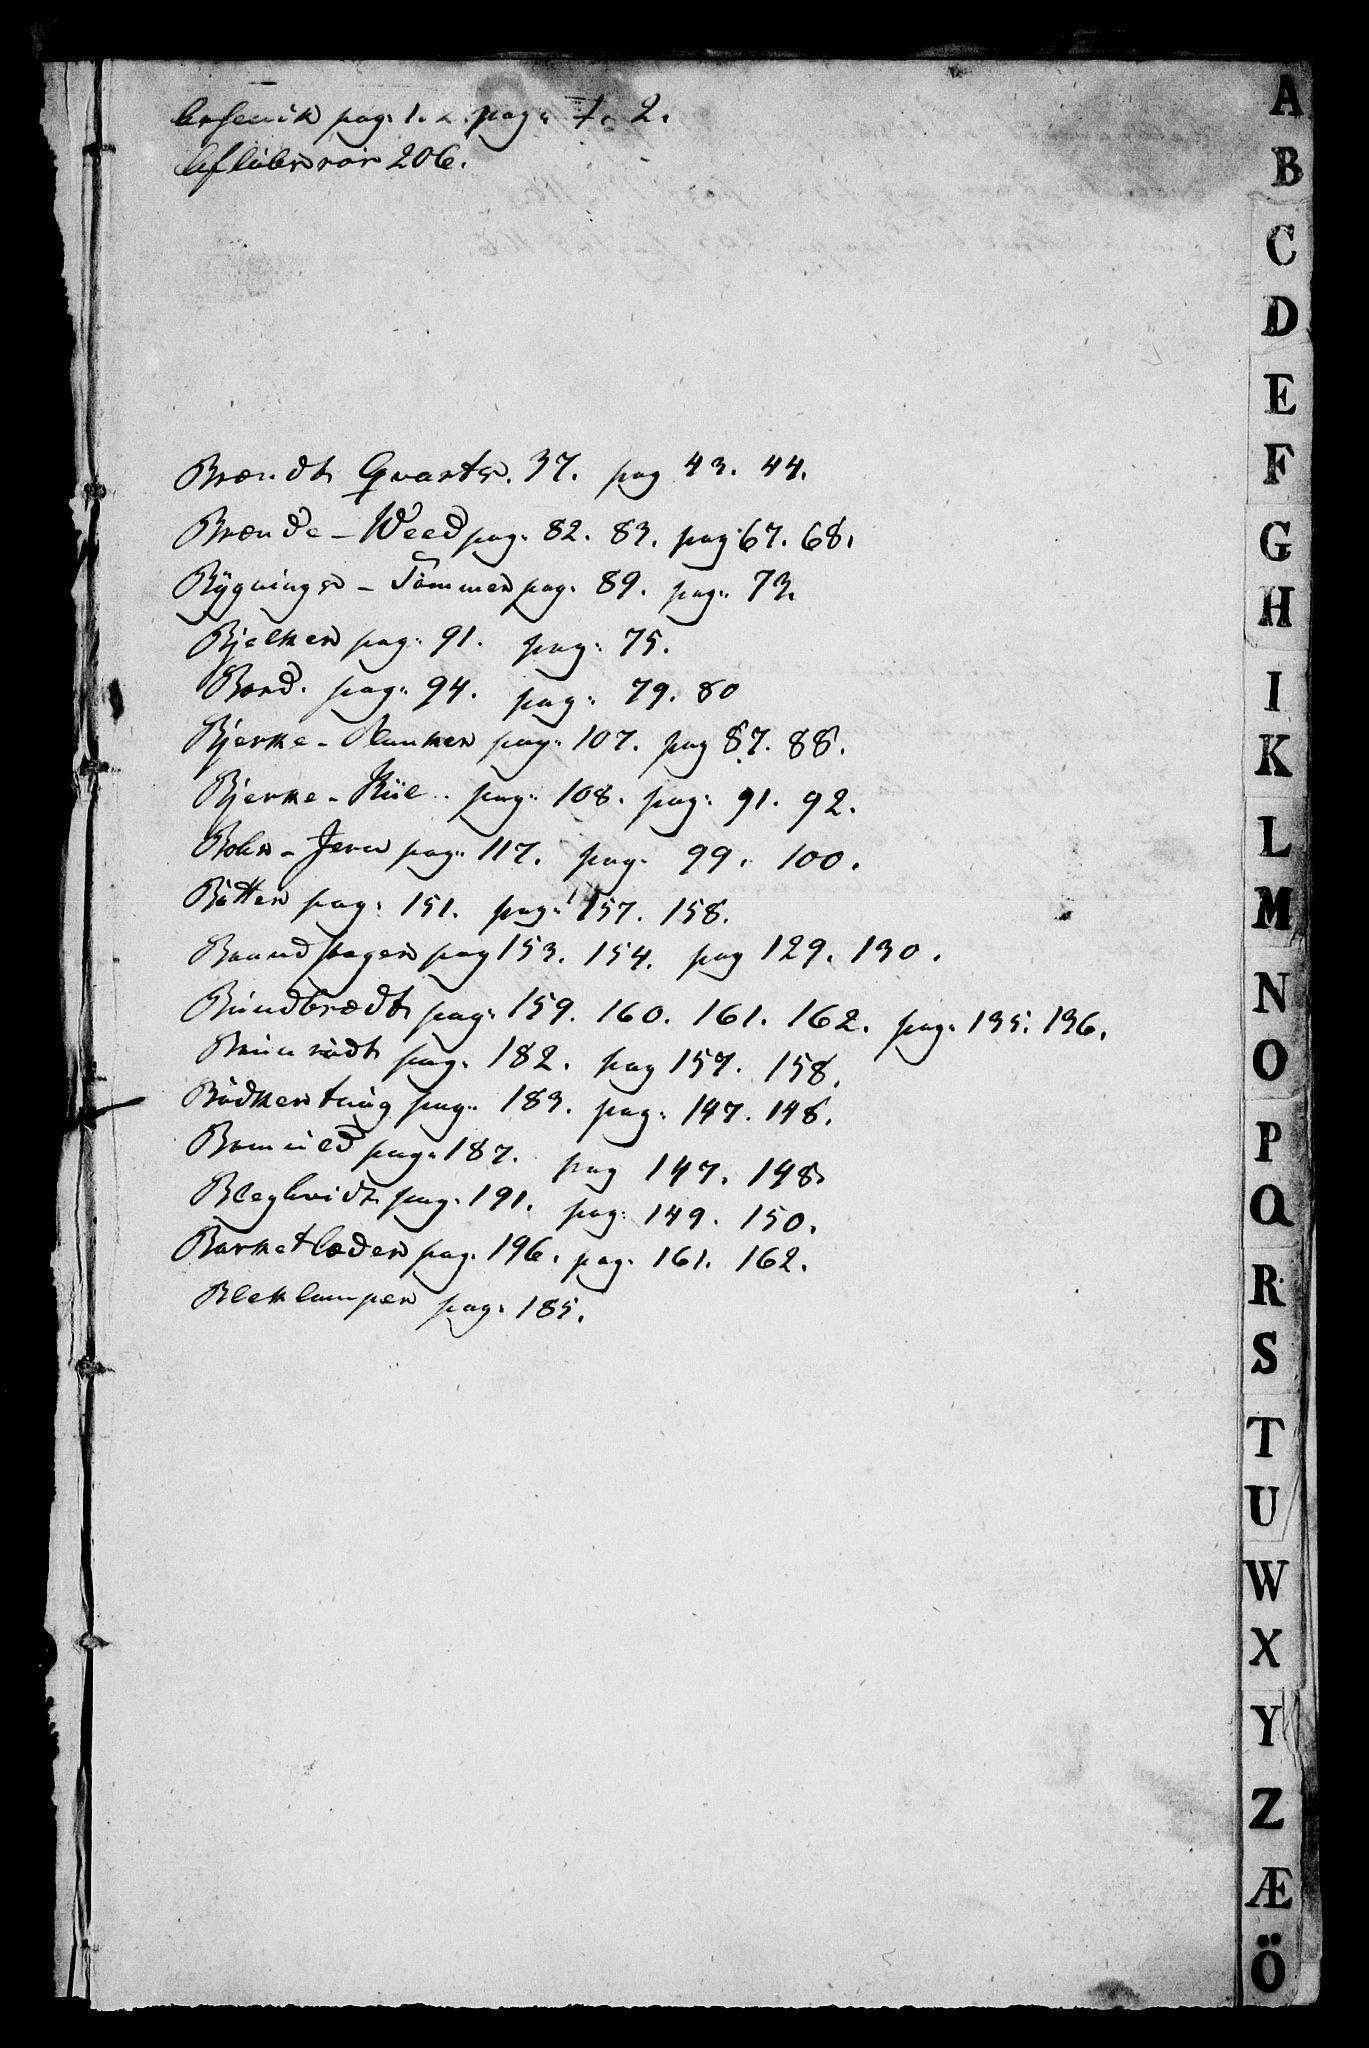 RA, Modums Blaafarveværk, G/Gd/Gdb/L0191: Materialhovedbok, 1827-1829, s. 2